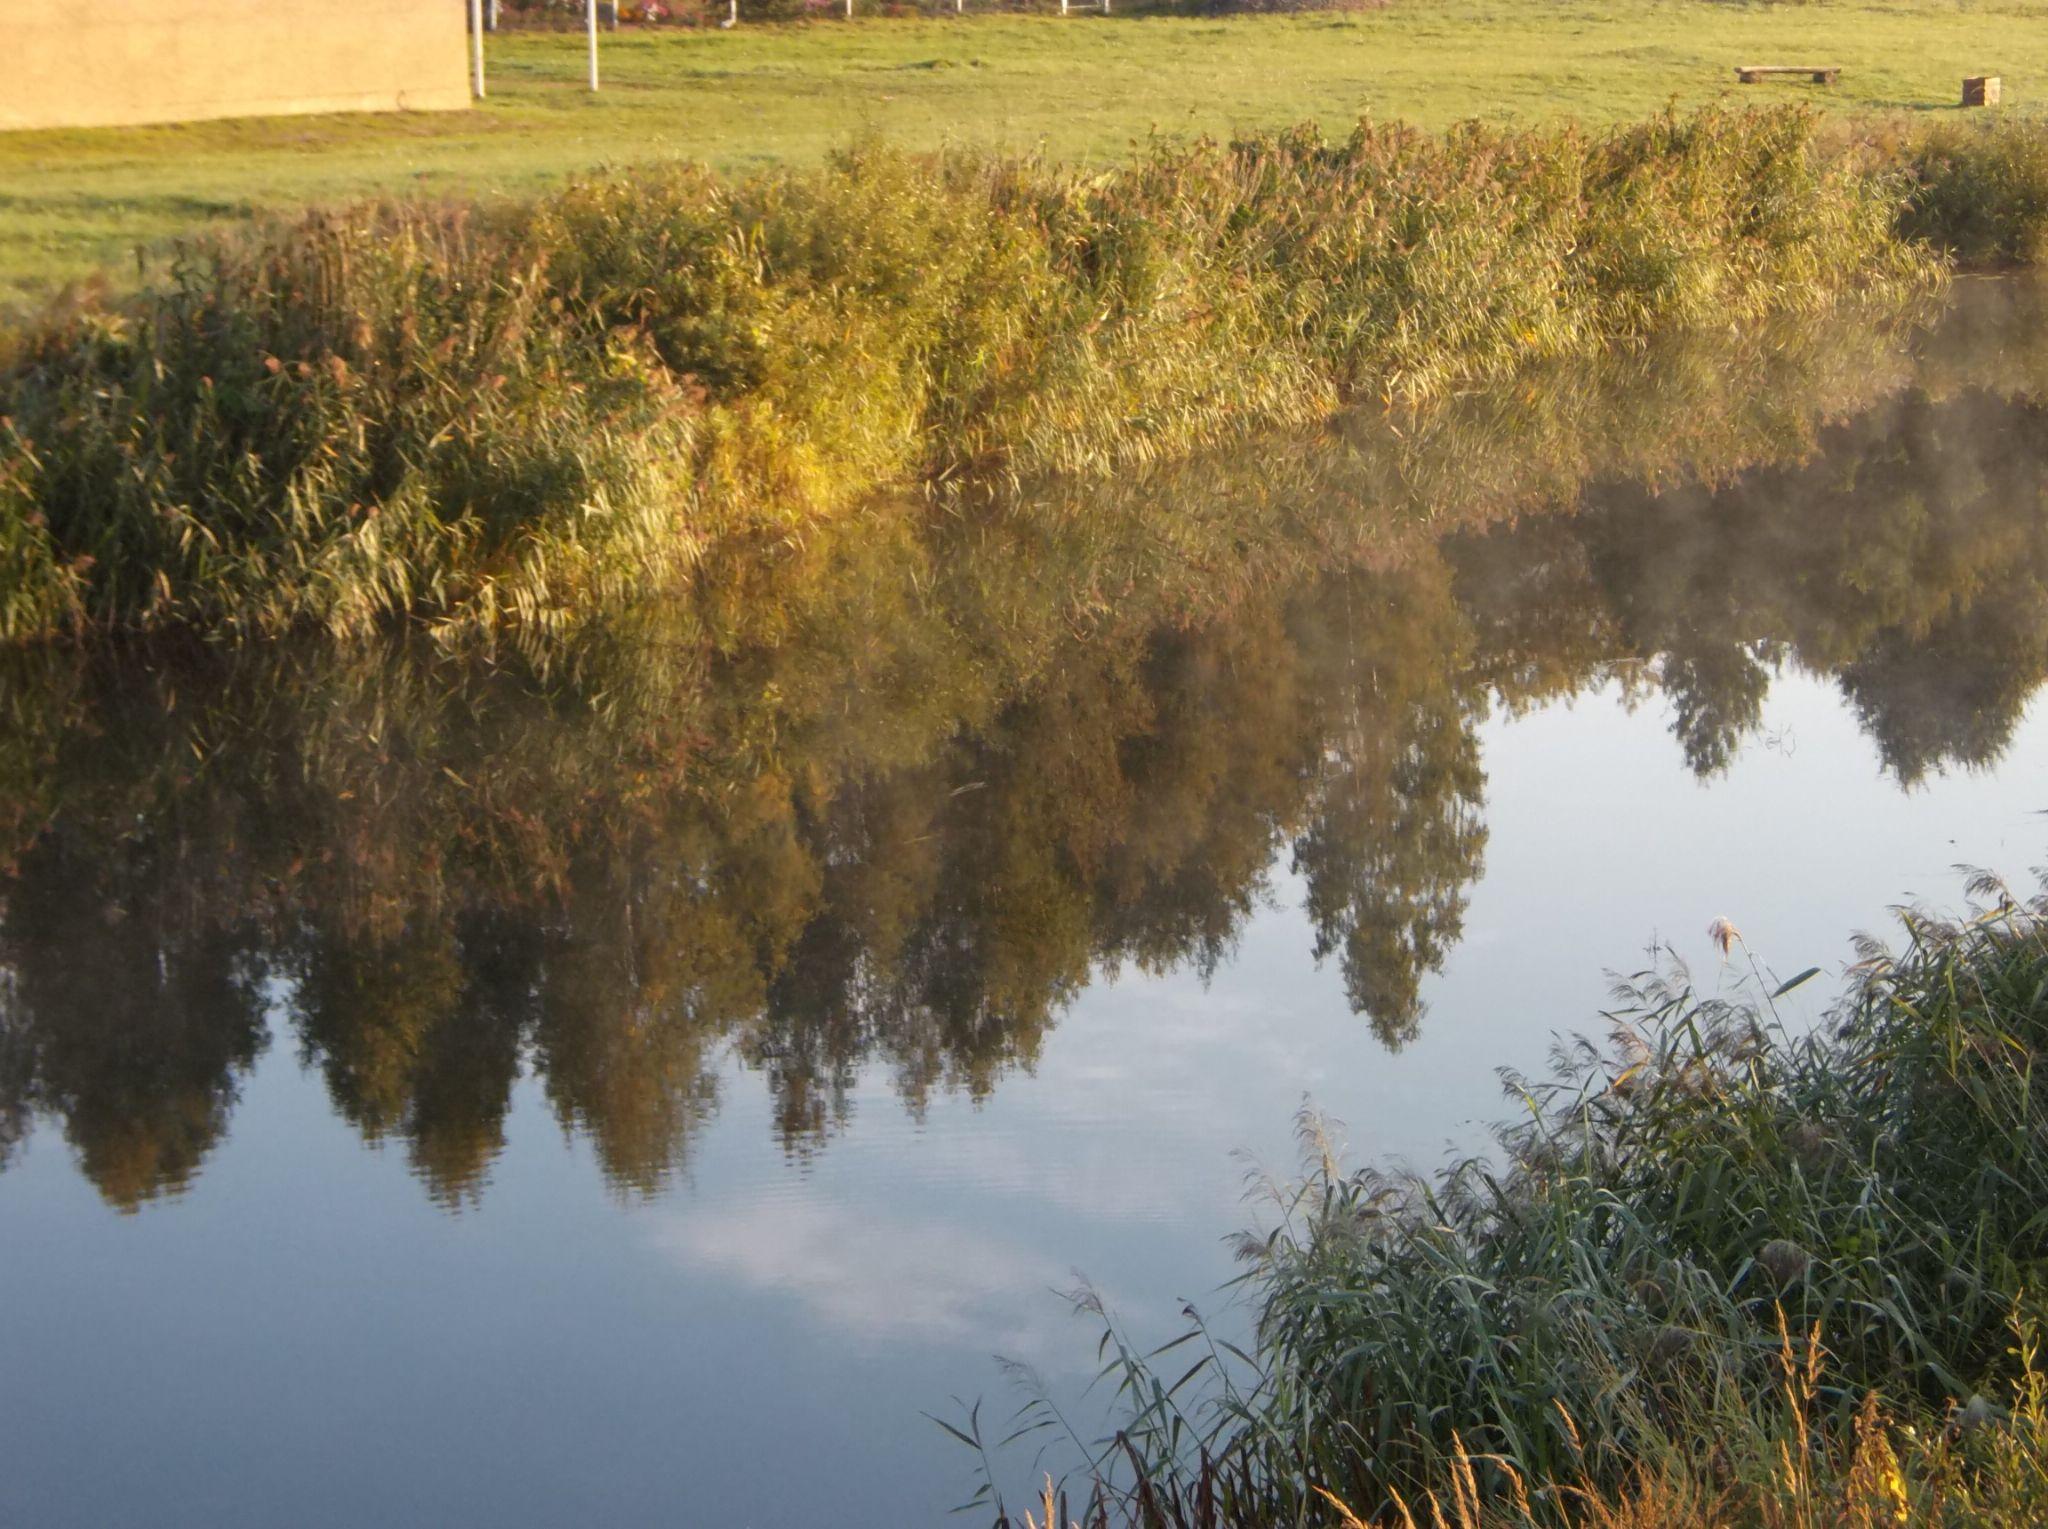 SReflections on the river. by Zita Užkuraitienė